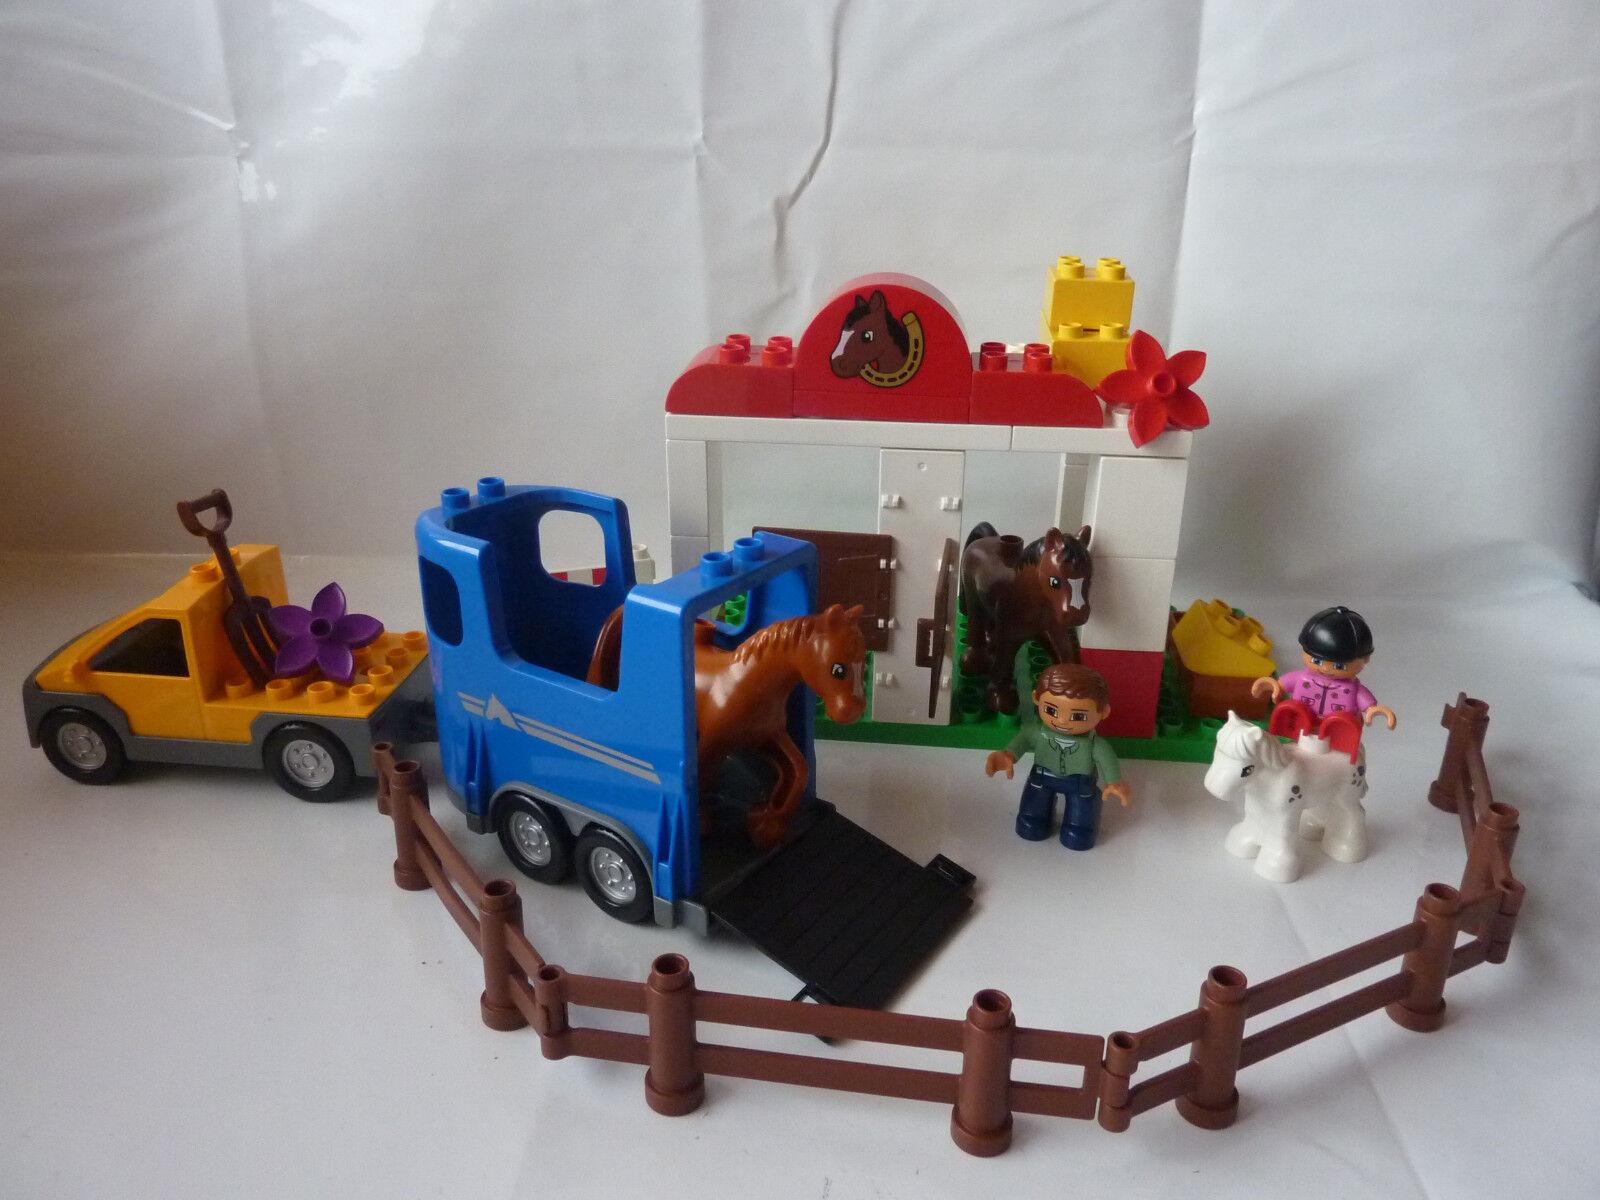 LEGO Duplo Reiterhof 5648 5648 5648 - Reitstall - Pferdestall - Pferd - Range - Pony -TOP 6ed32c